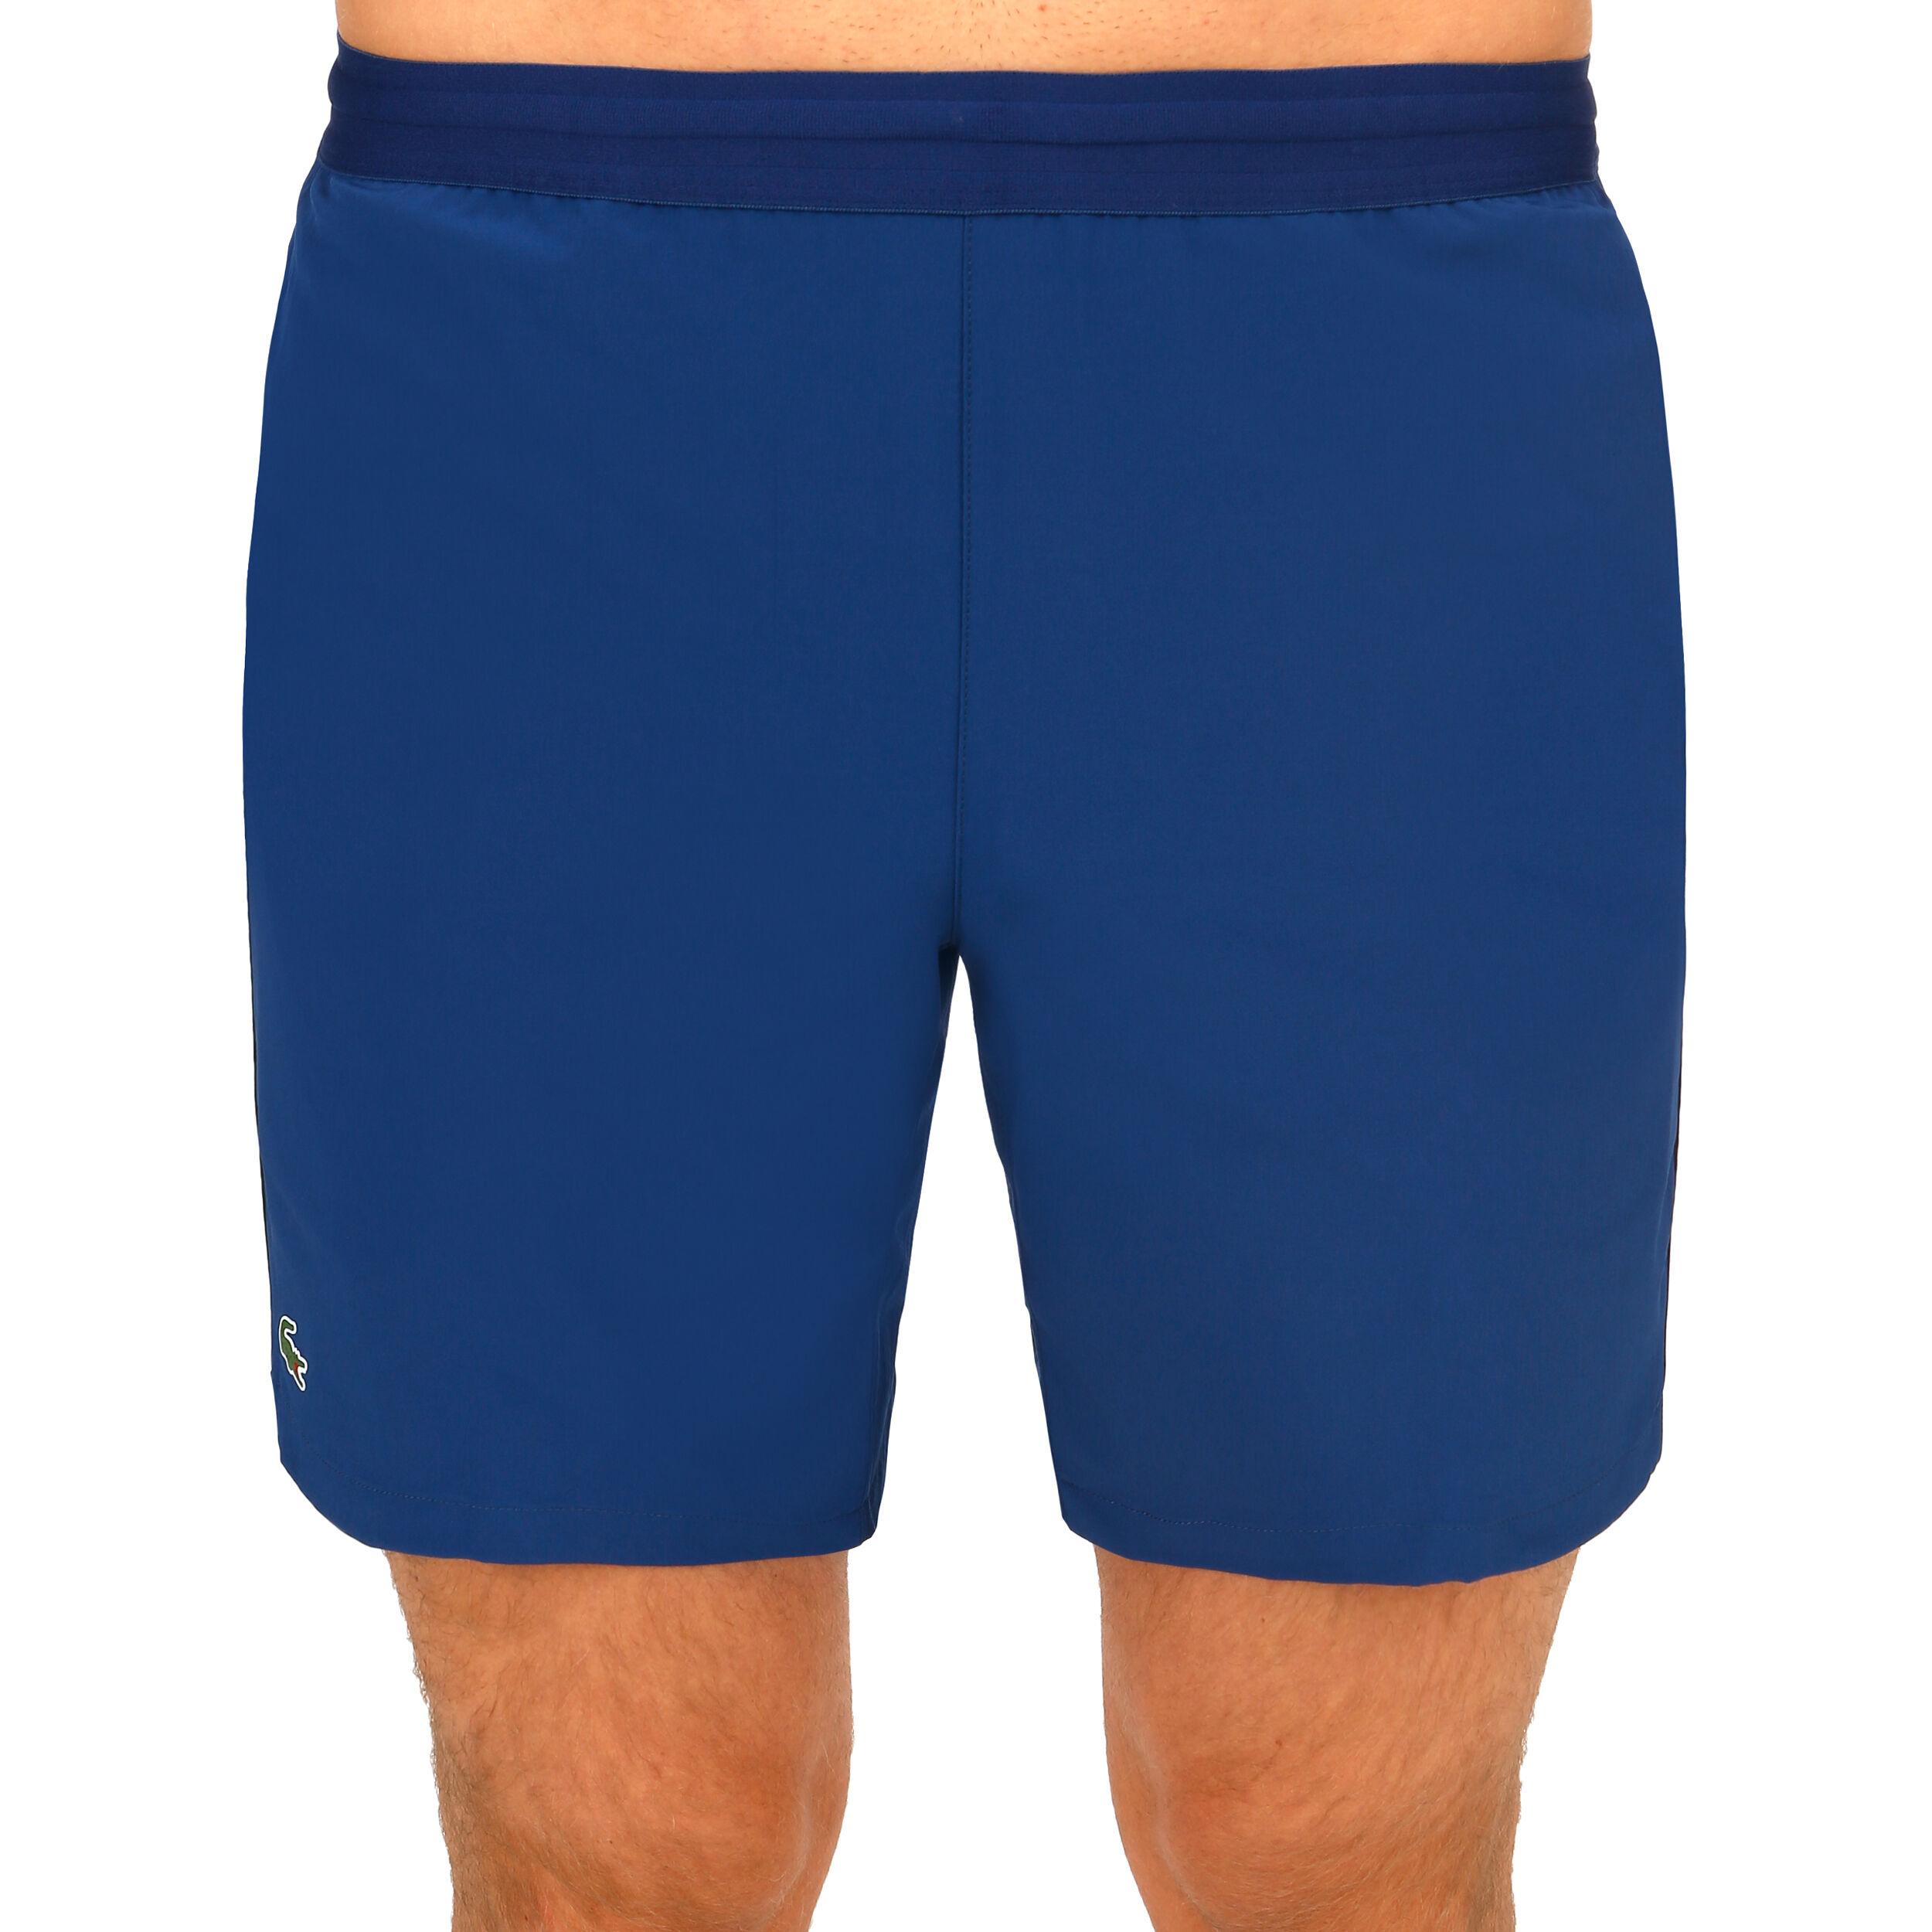 Lacoste Djokovic Bleu Hommes Shorts FoncéNoir Novak En Acheter MVSGLqzUp